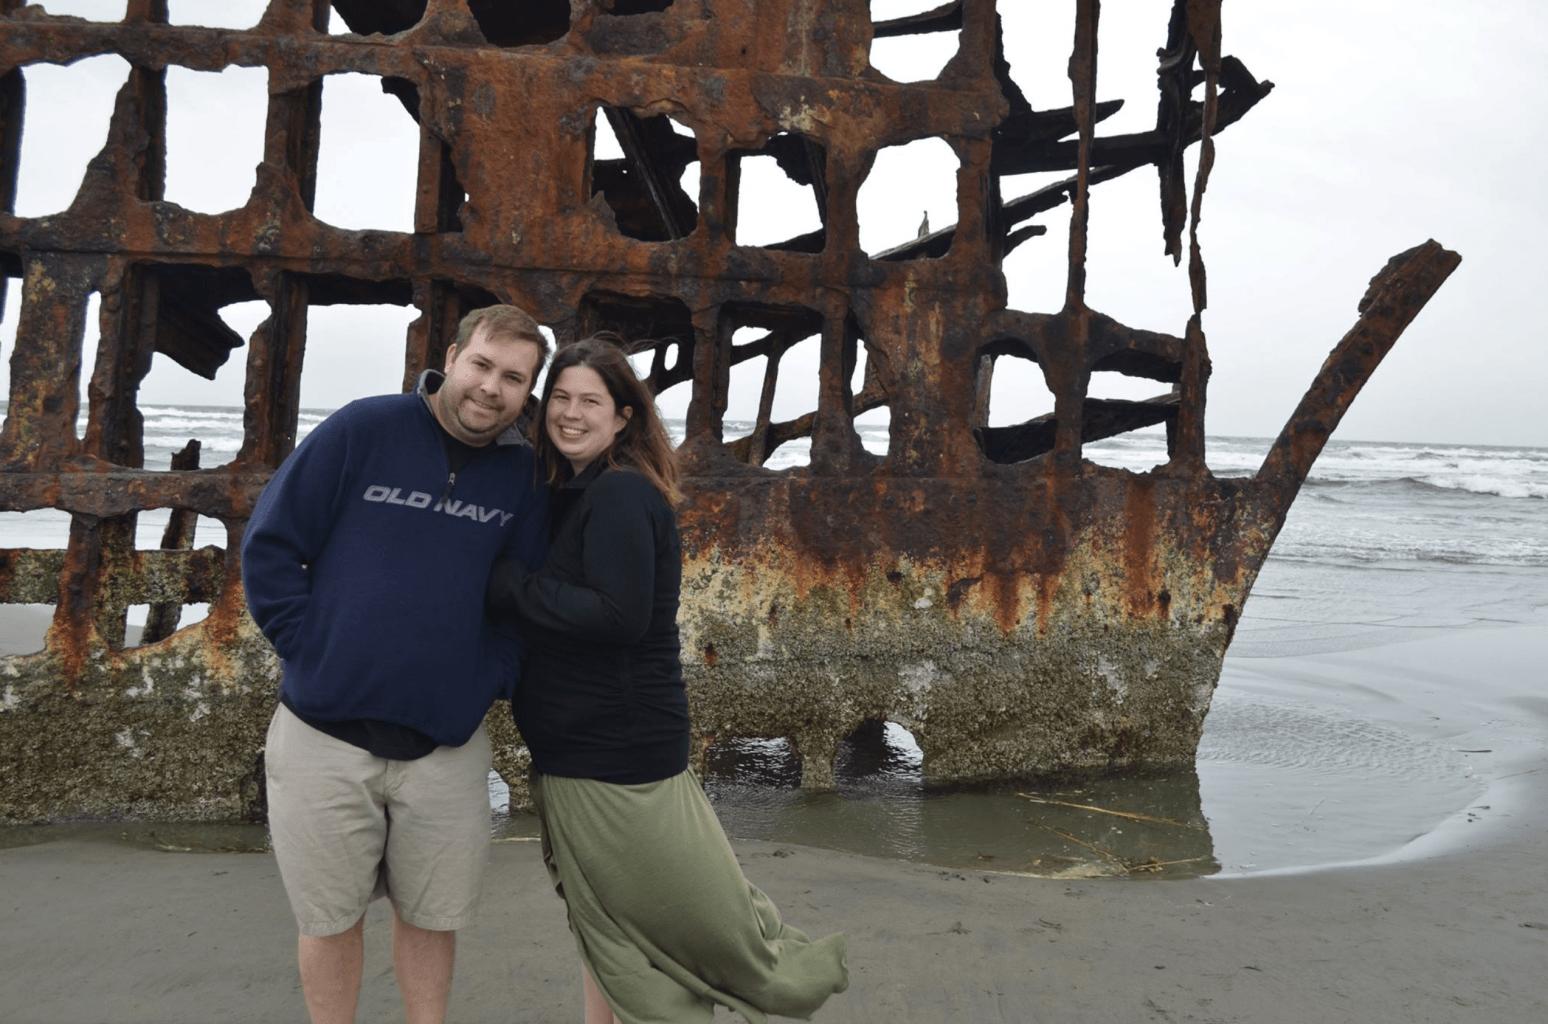 Oregon Shipwreck Peter Iredale Shipwreck